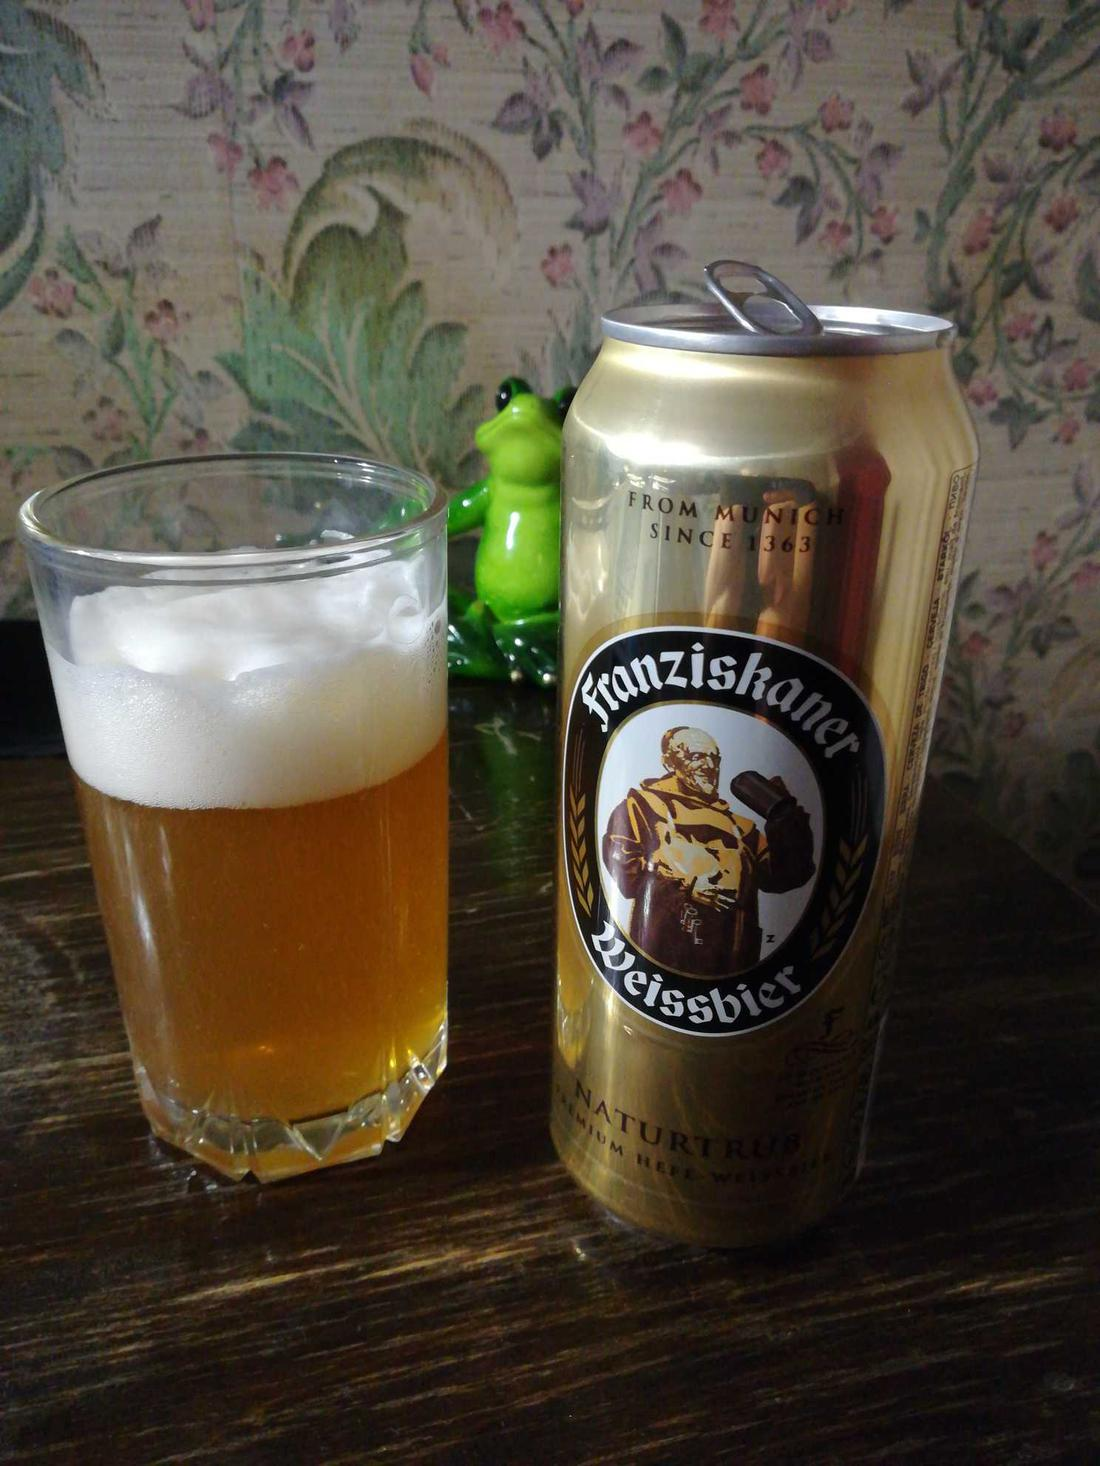 Пиво «Францисканер Хефе-Вайсбир» («Franziskaner Hefe-Weissbier»). Изготовитель: Spaten Franziskaner Bräu GmbH